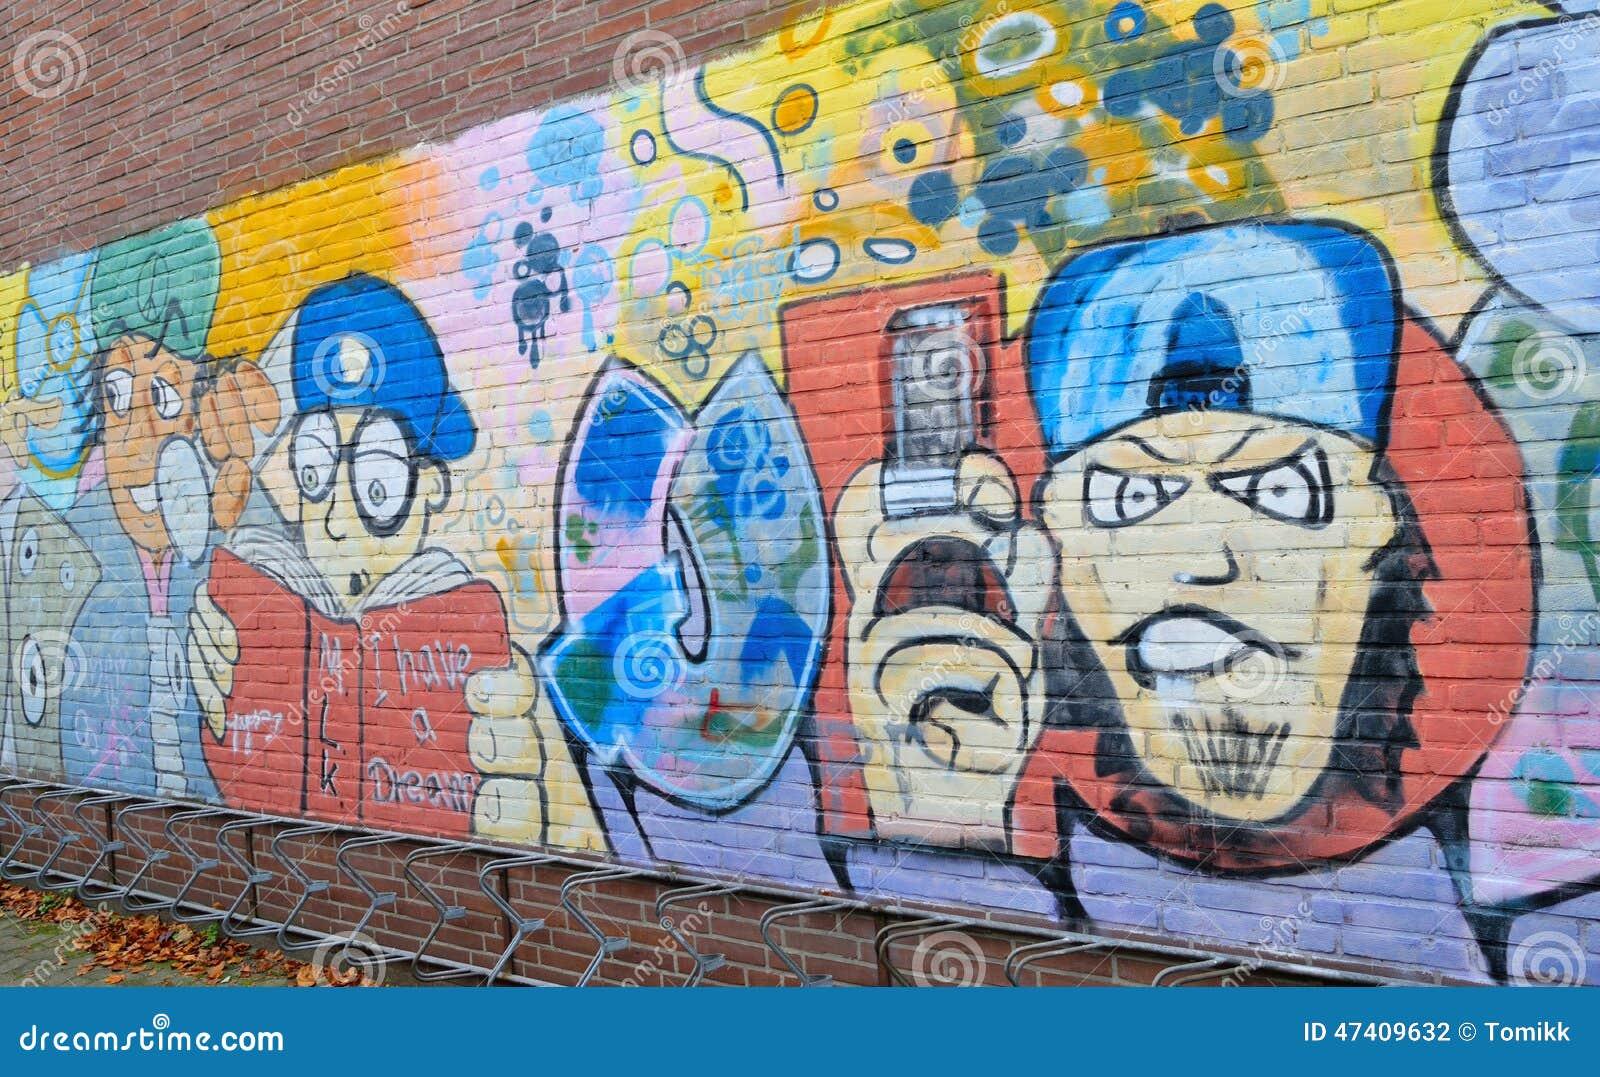 Brick Wall Art graffiti brick wall art in germany editorial photography - image